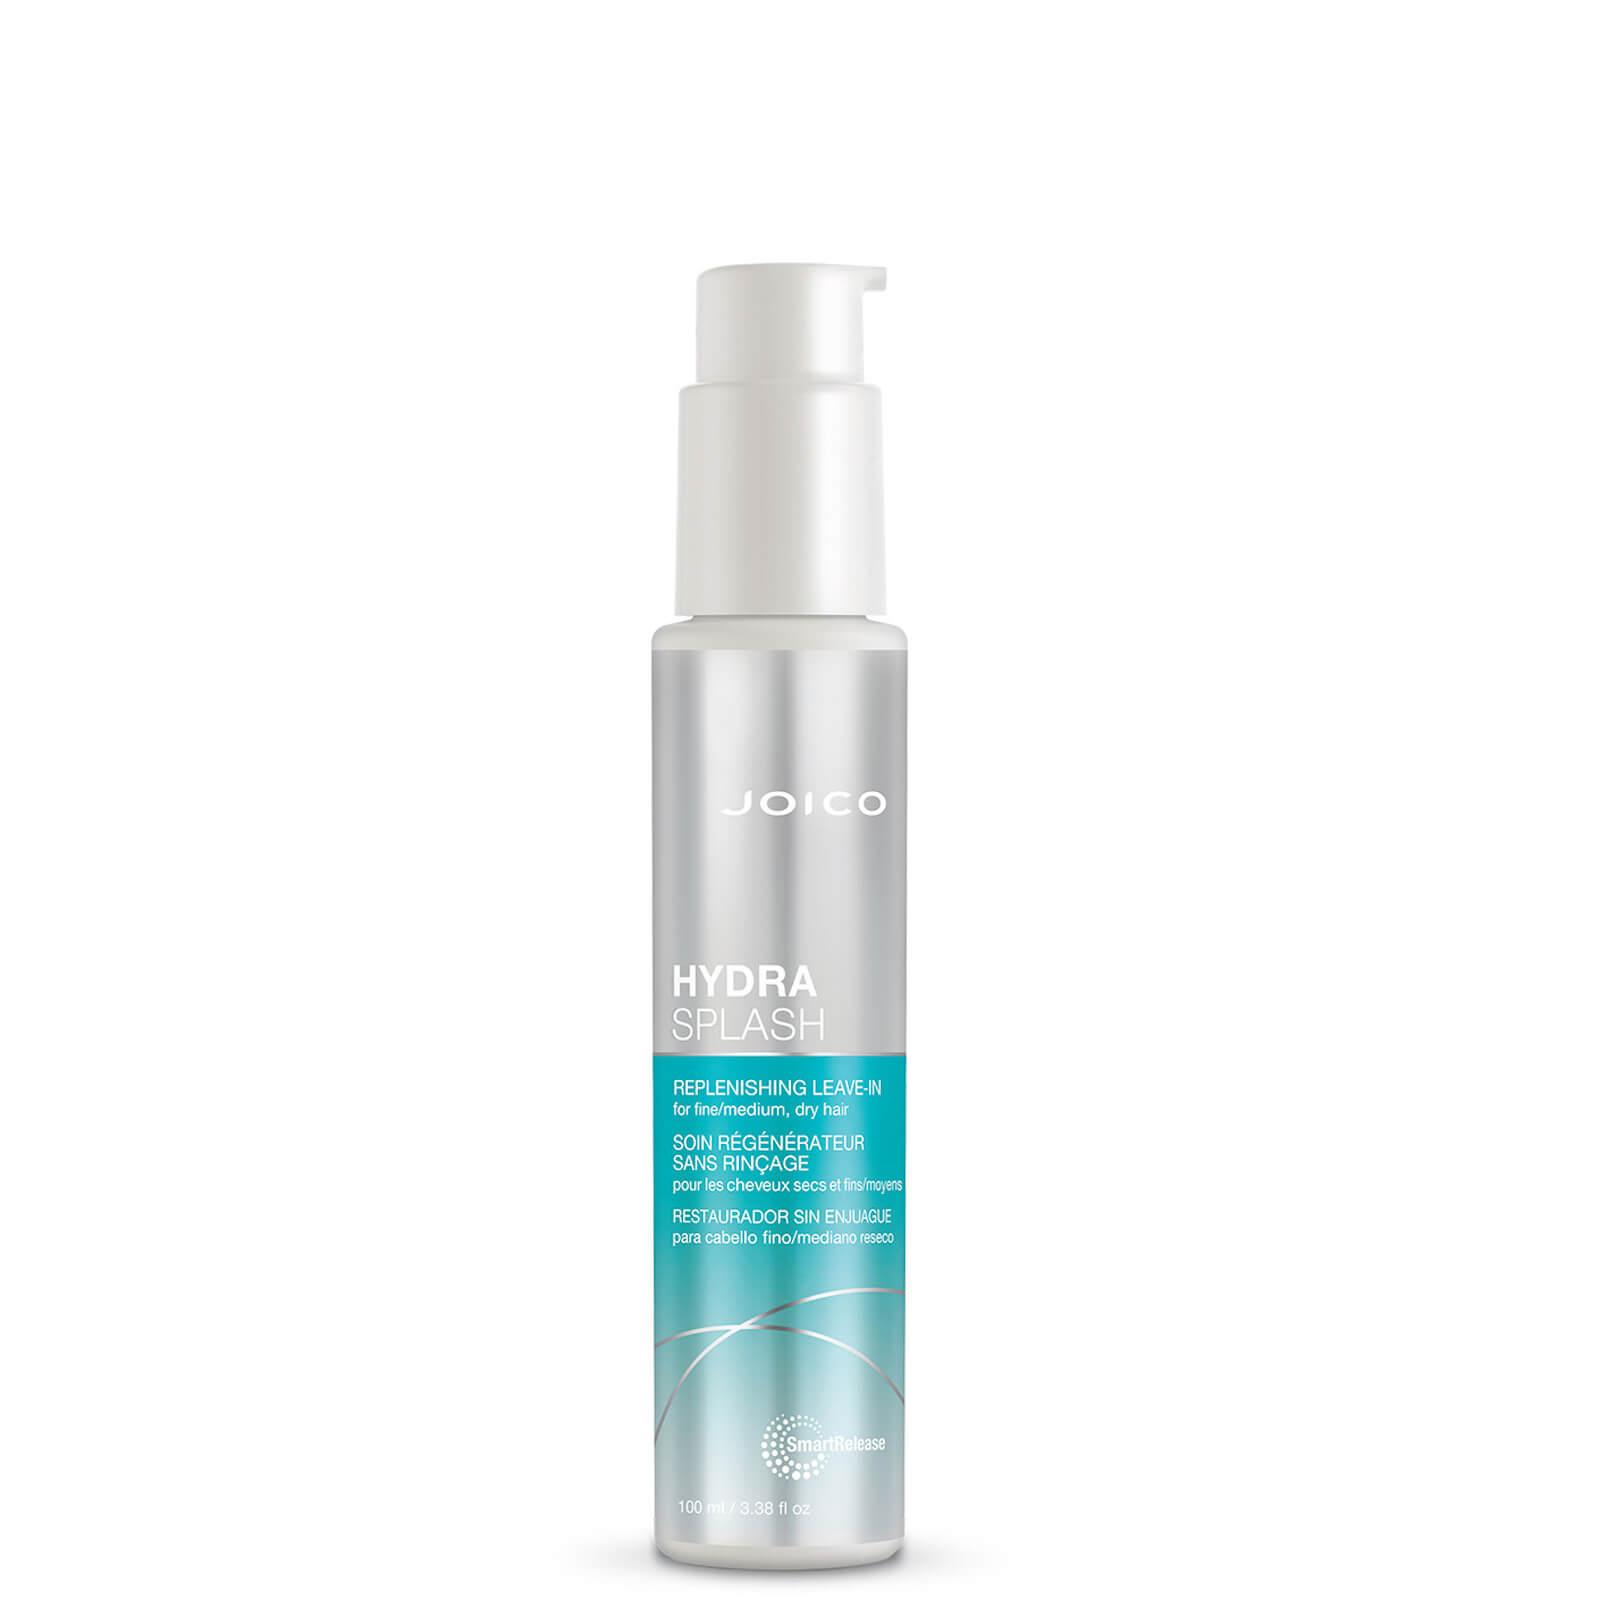 Купить Joico Hydra Splash Replenishing Leave-In For Fine-Medium, Dry Hair 100ml